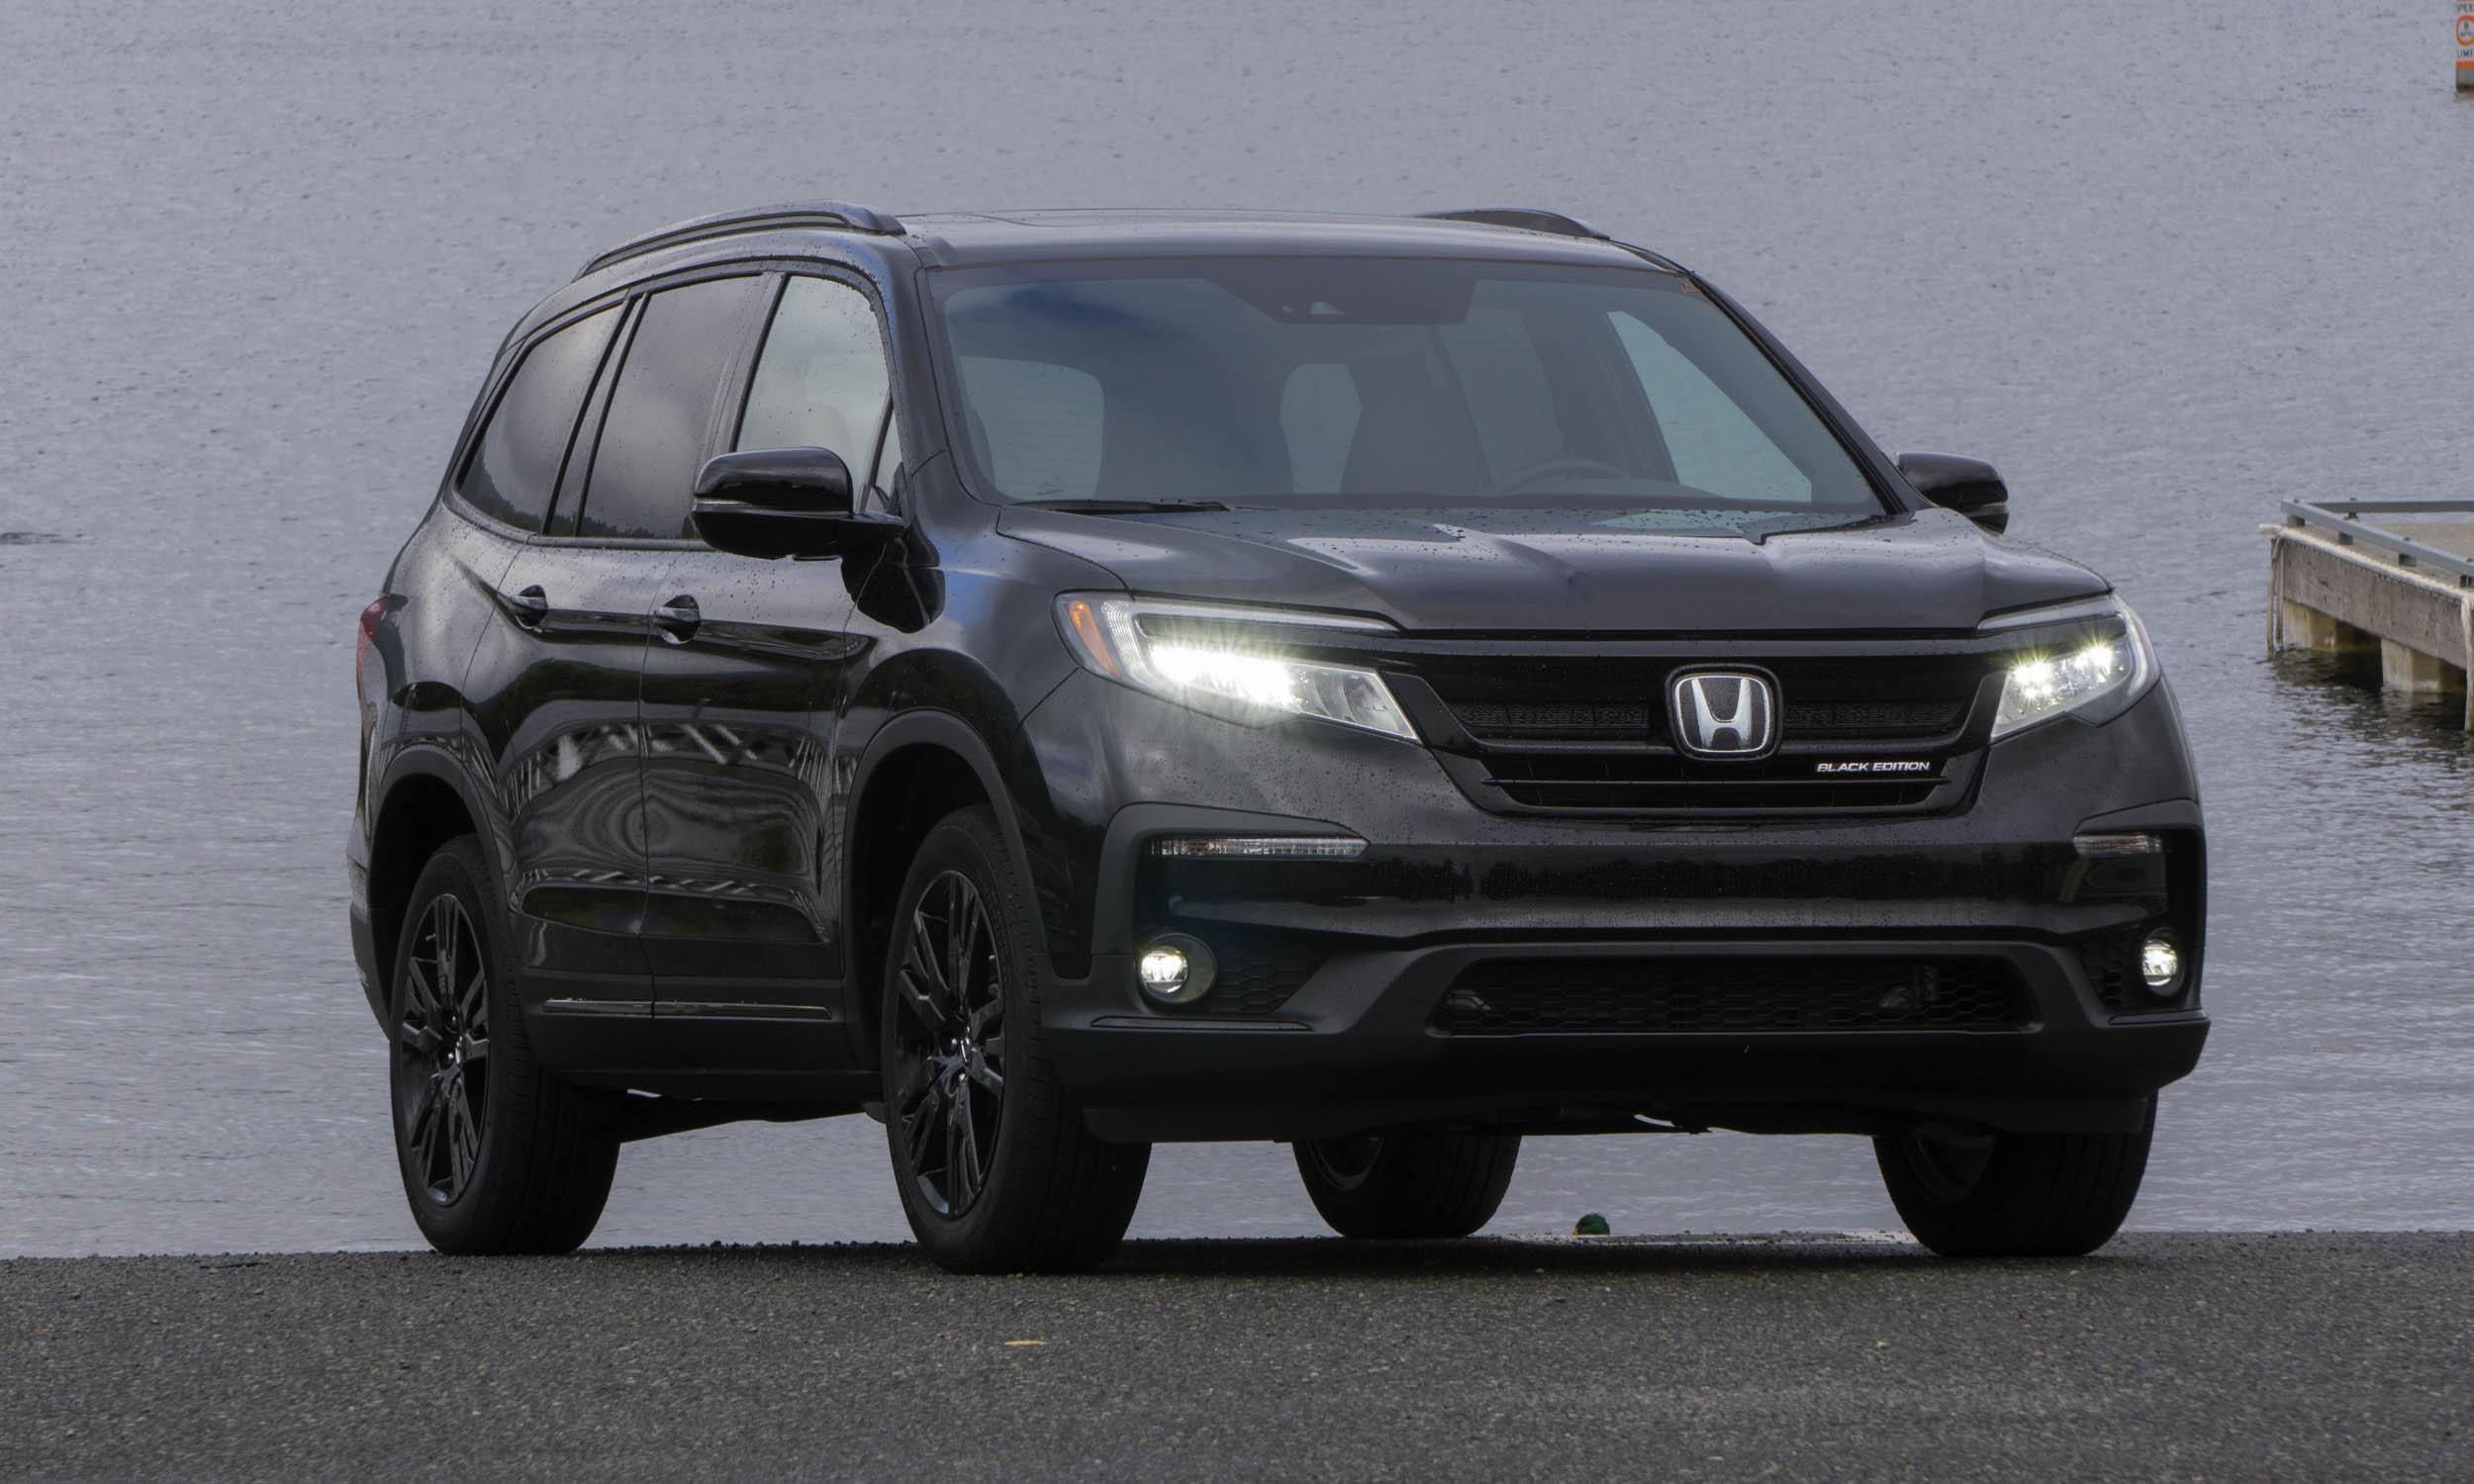 2020 Honda Pilot Black Edition Reviewnbsp